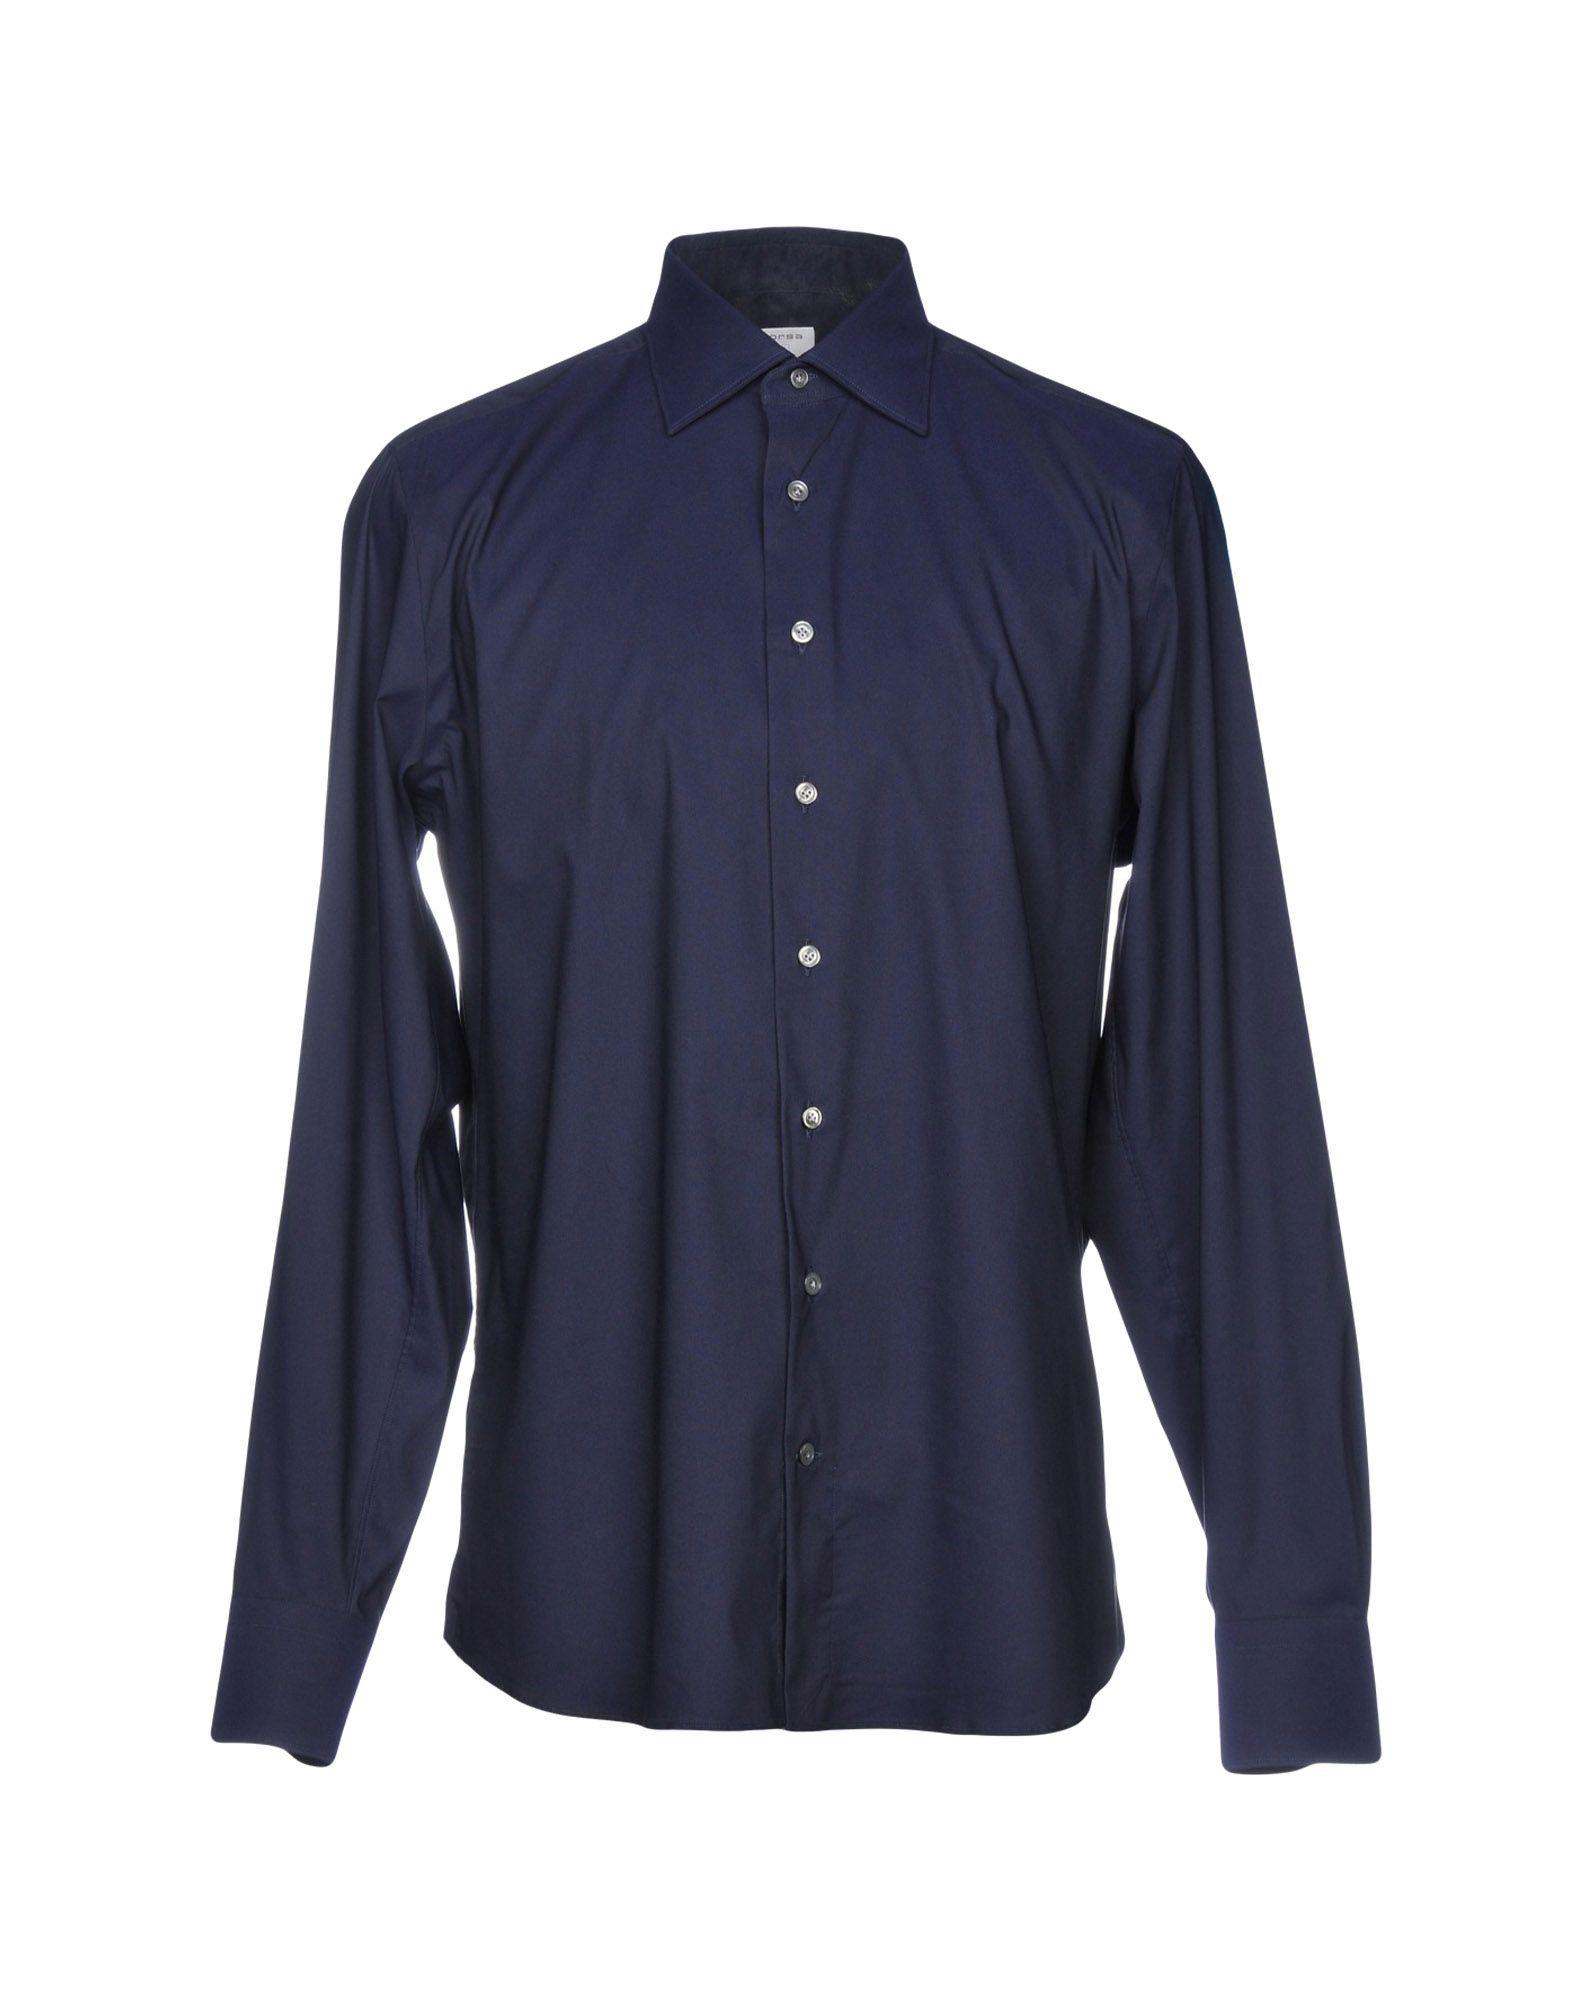 BORSA Solid Color Shirt in Dark Blue